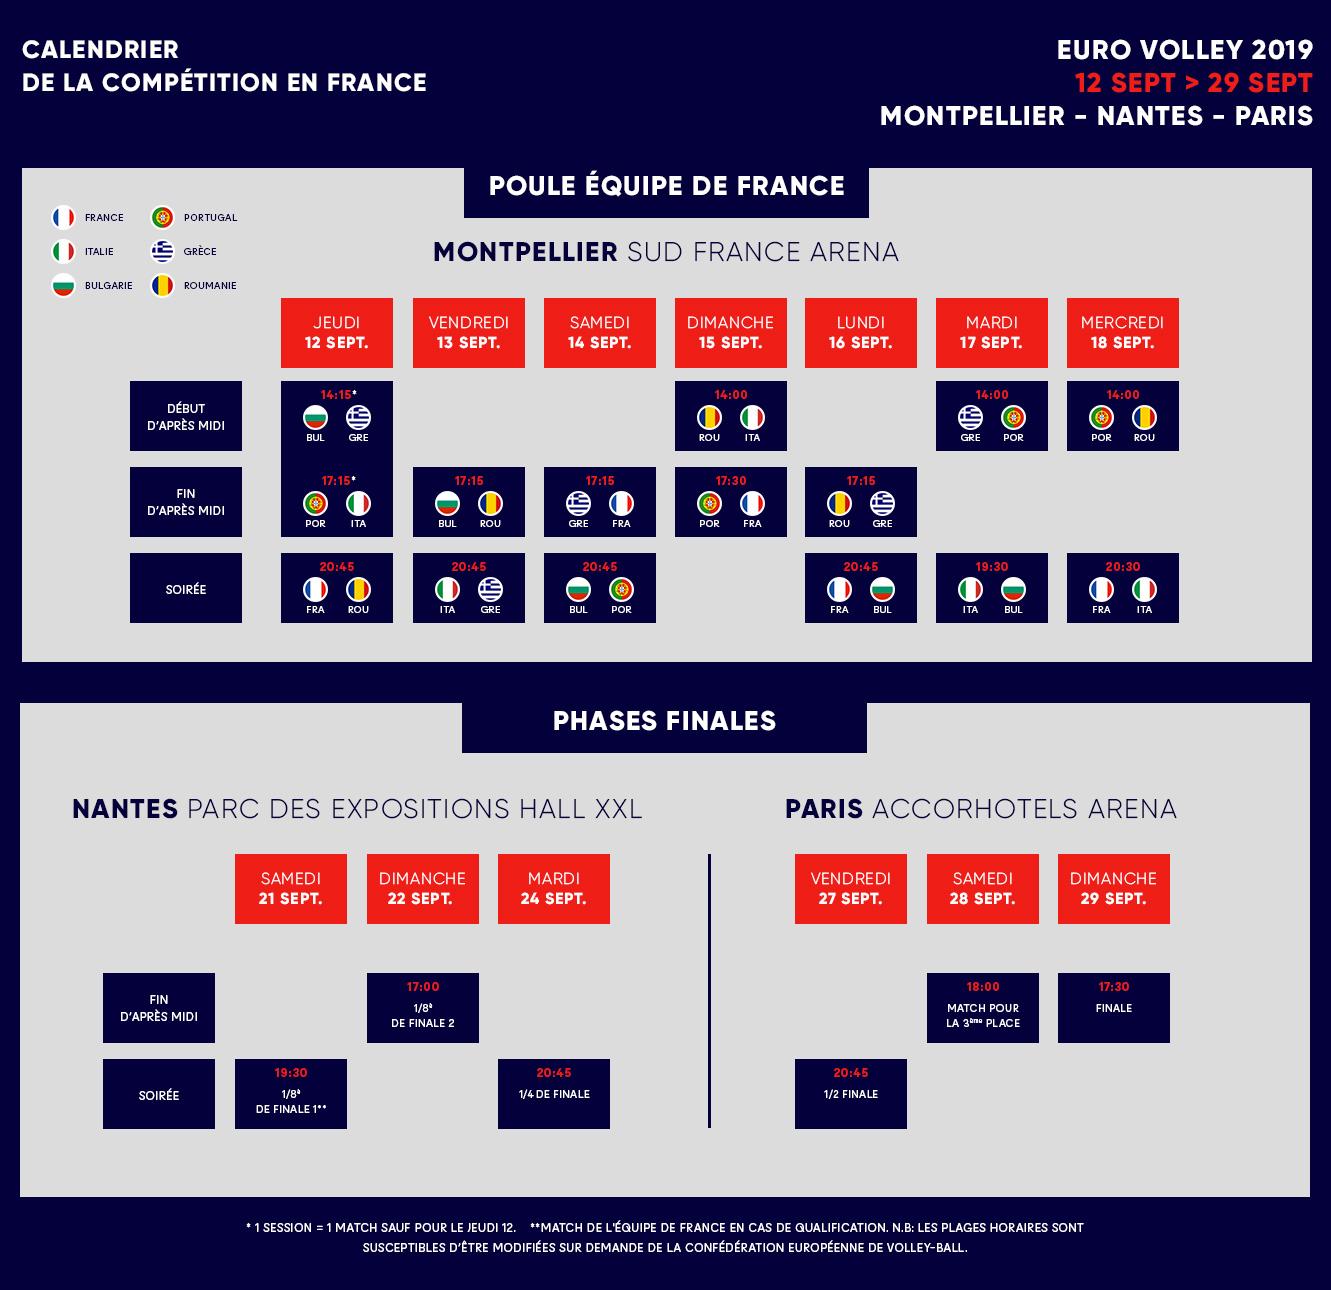 L Equipe Calendrier Euro 2020.Euro 2019 Ligue Des Pays De La Loire De Volley Ball